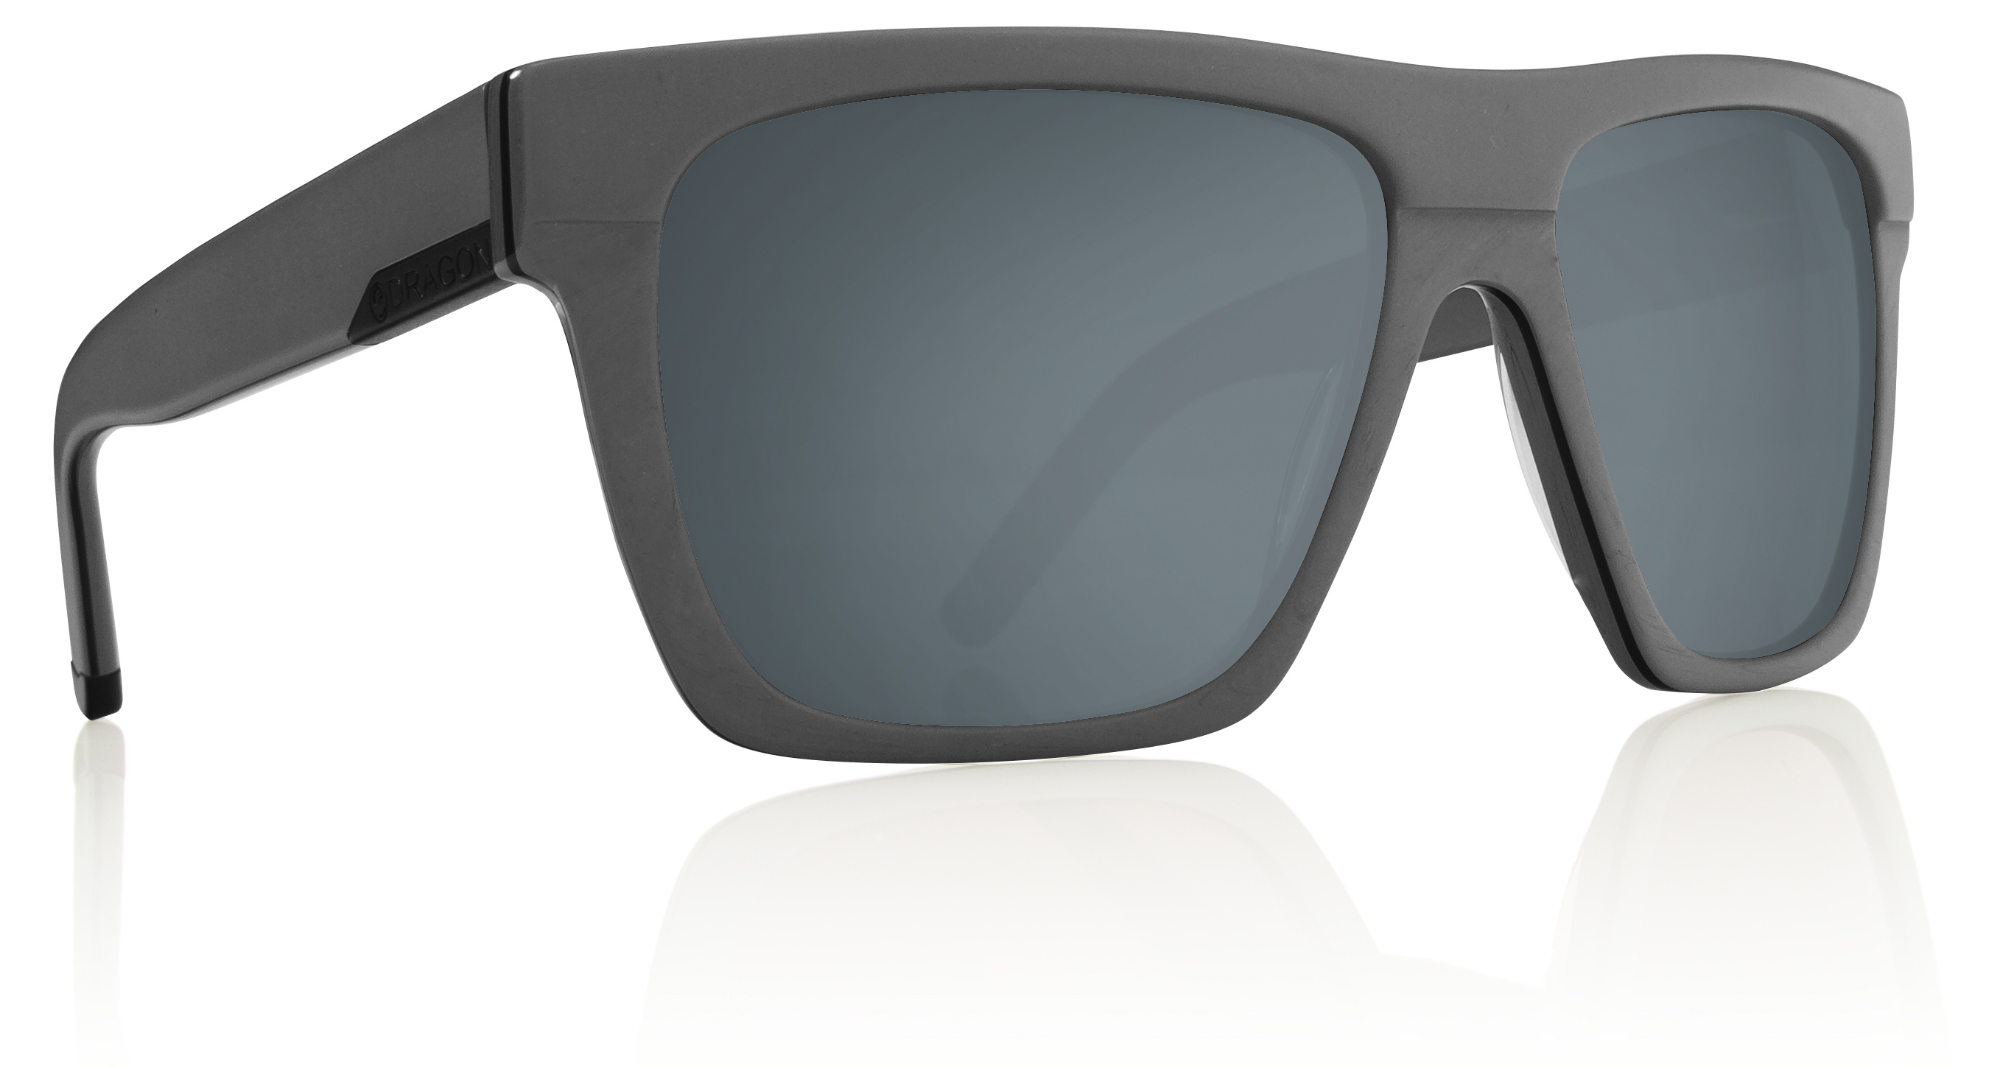 0e4c8bfadb Dragon Regal Sunglasses 6613-206